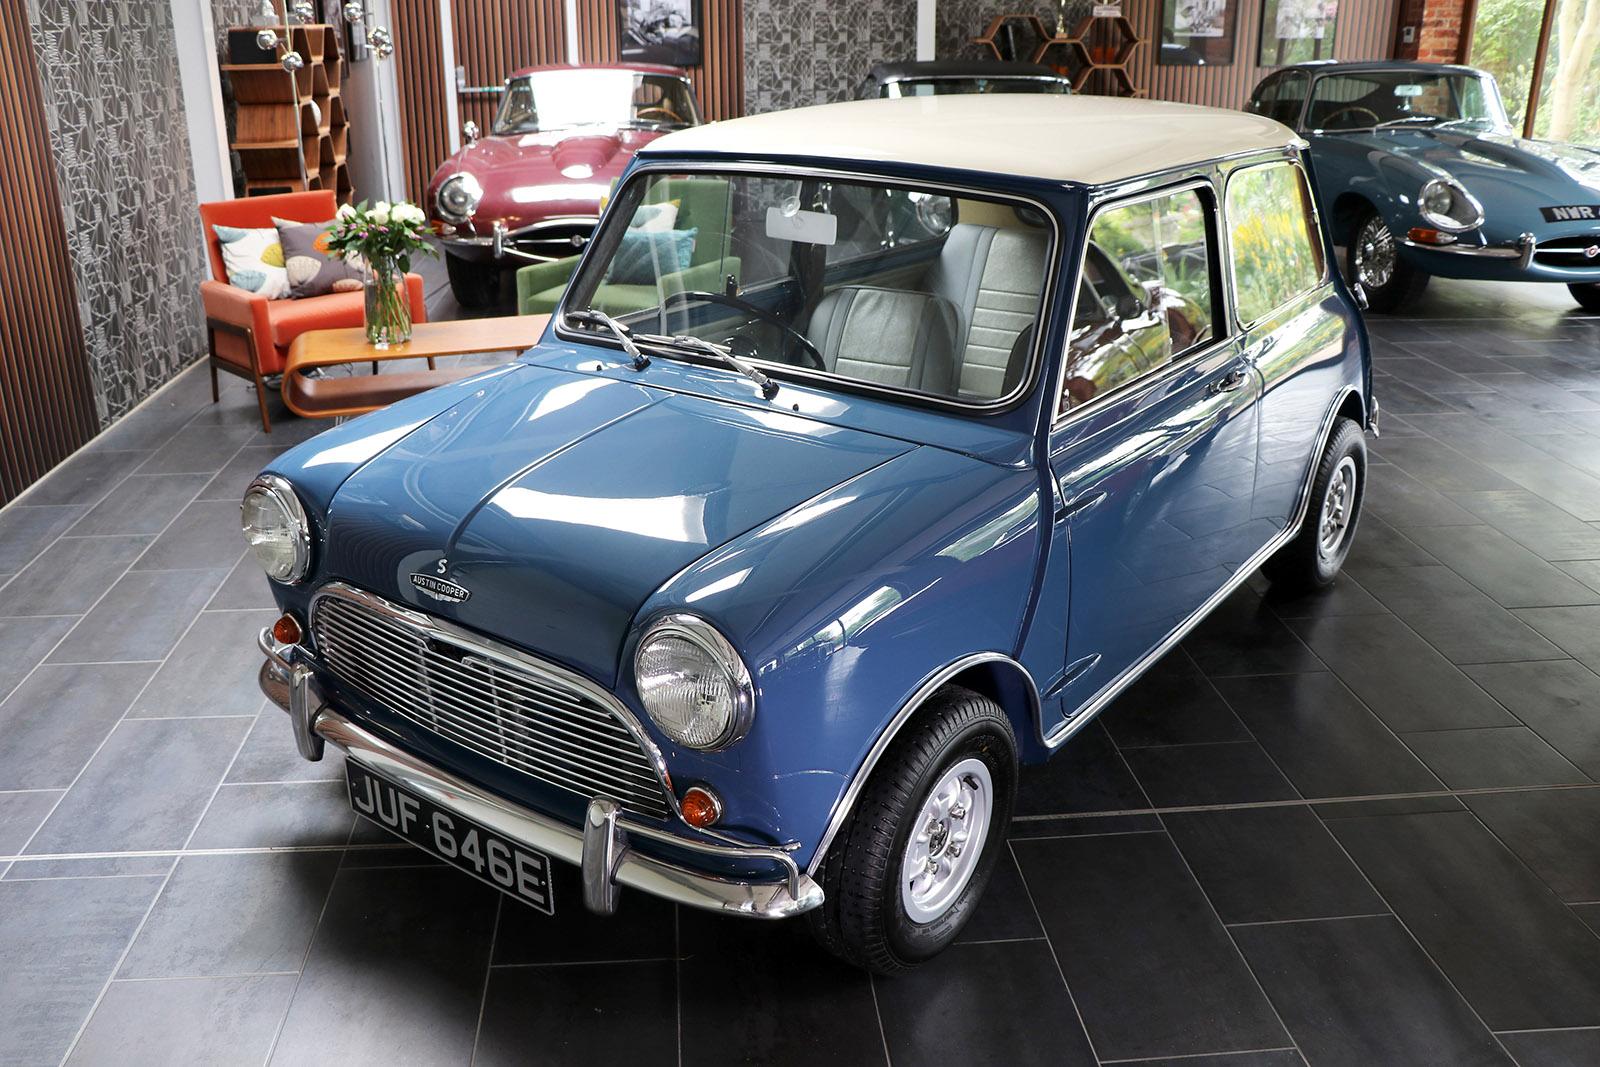 1967 blue 1275 Mini Cooper S Sayer Selection Wilkinson 1 web.jpg